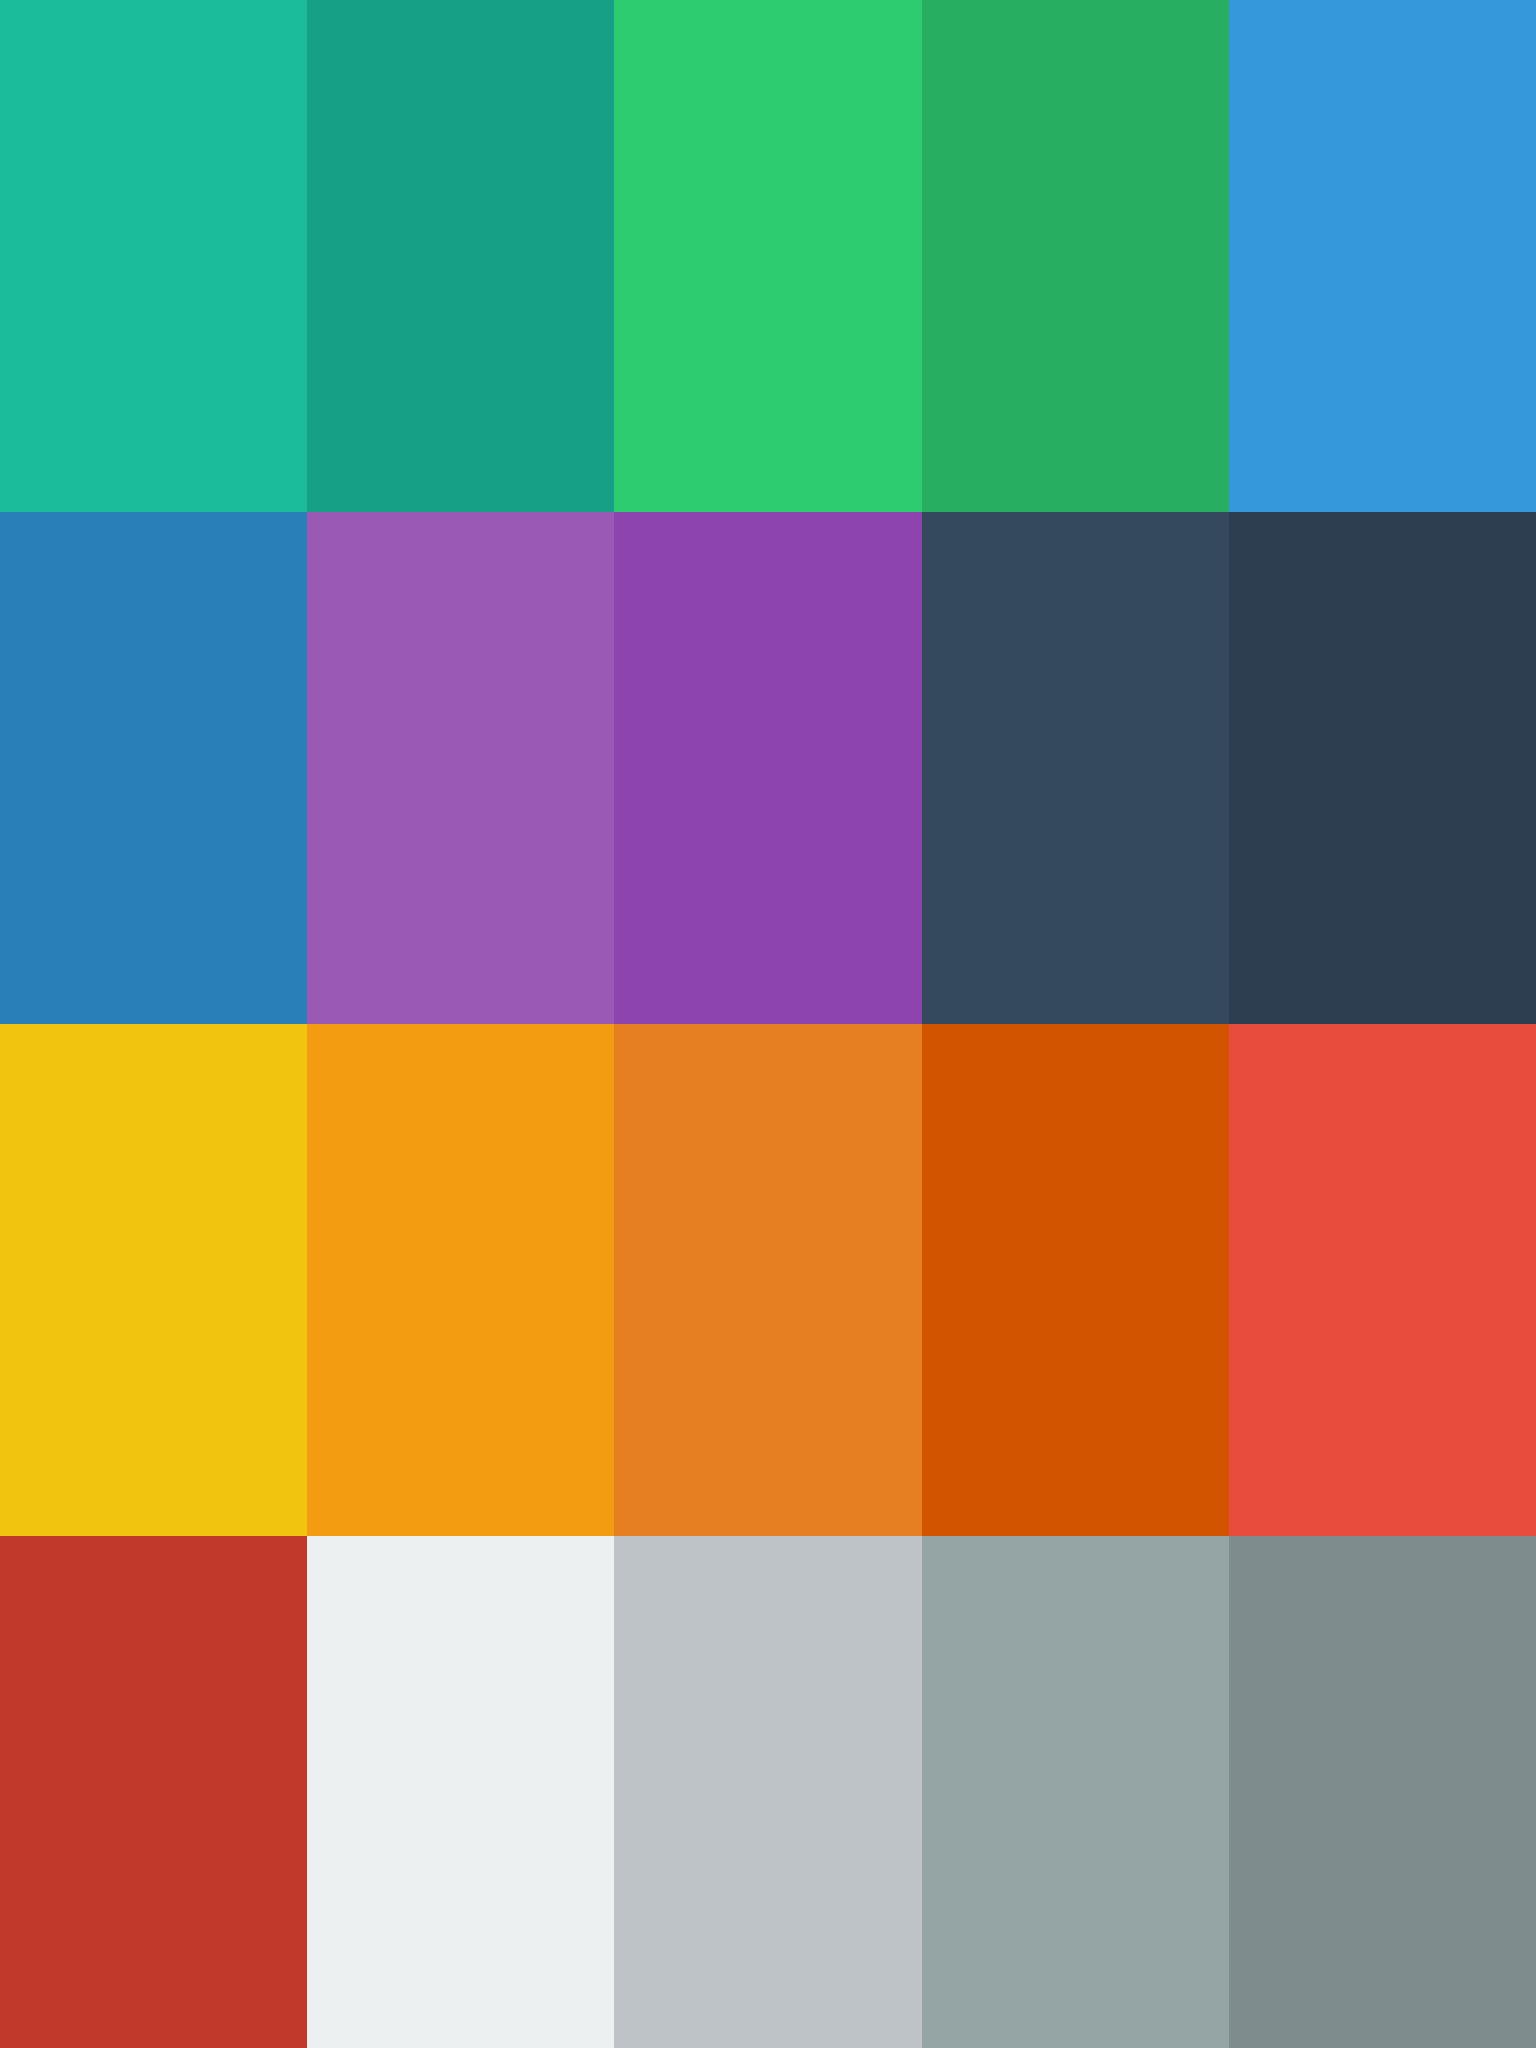 Flat design color picker